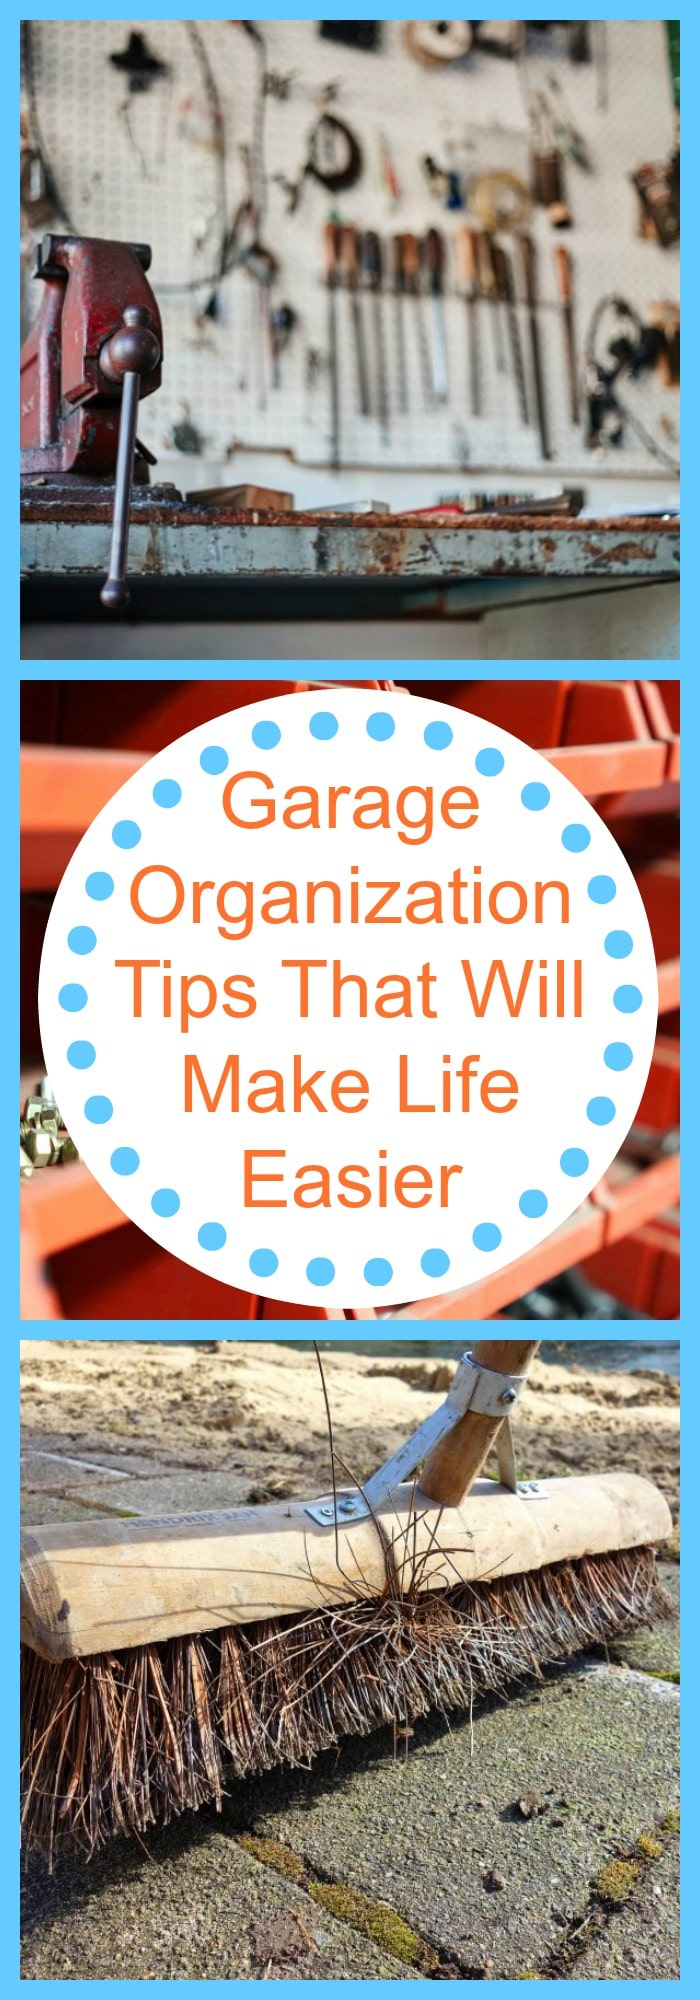 Garage Organization Tips That Will Make Life Easier